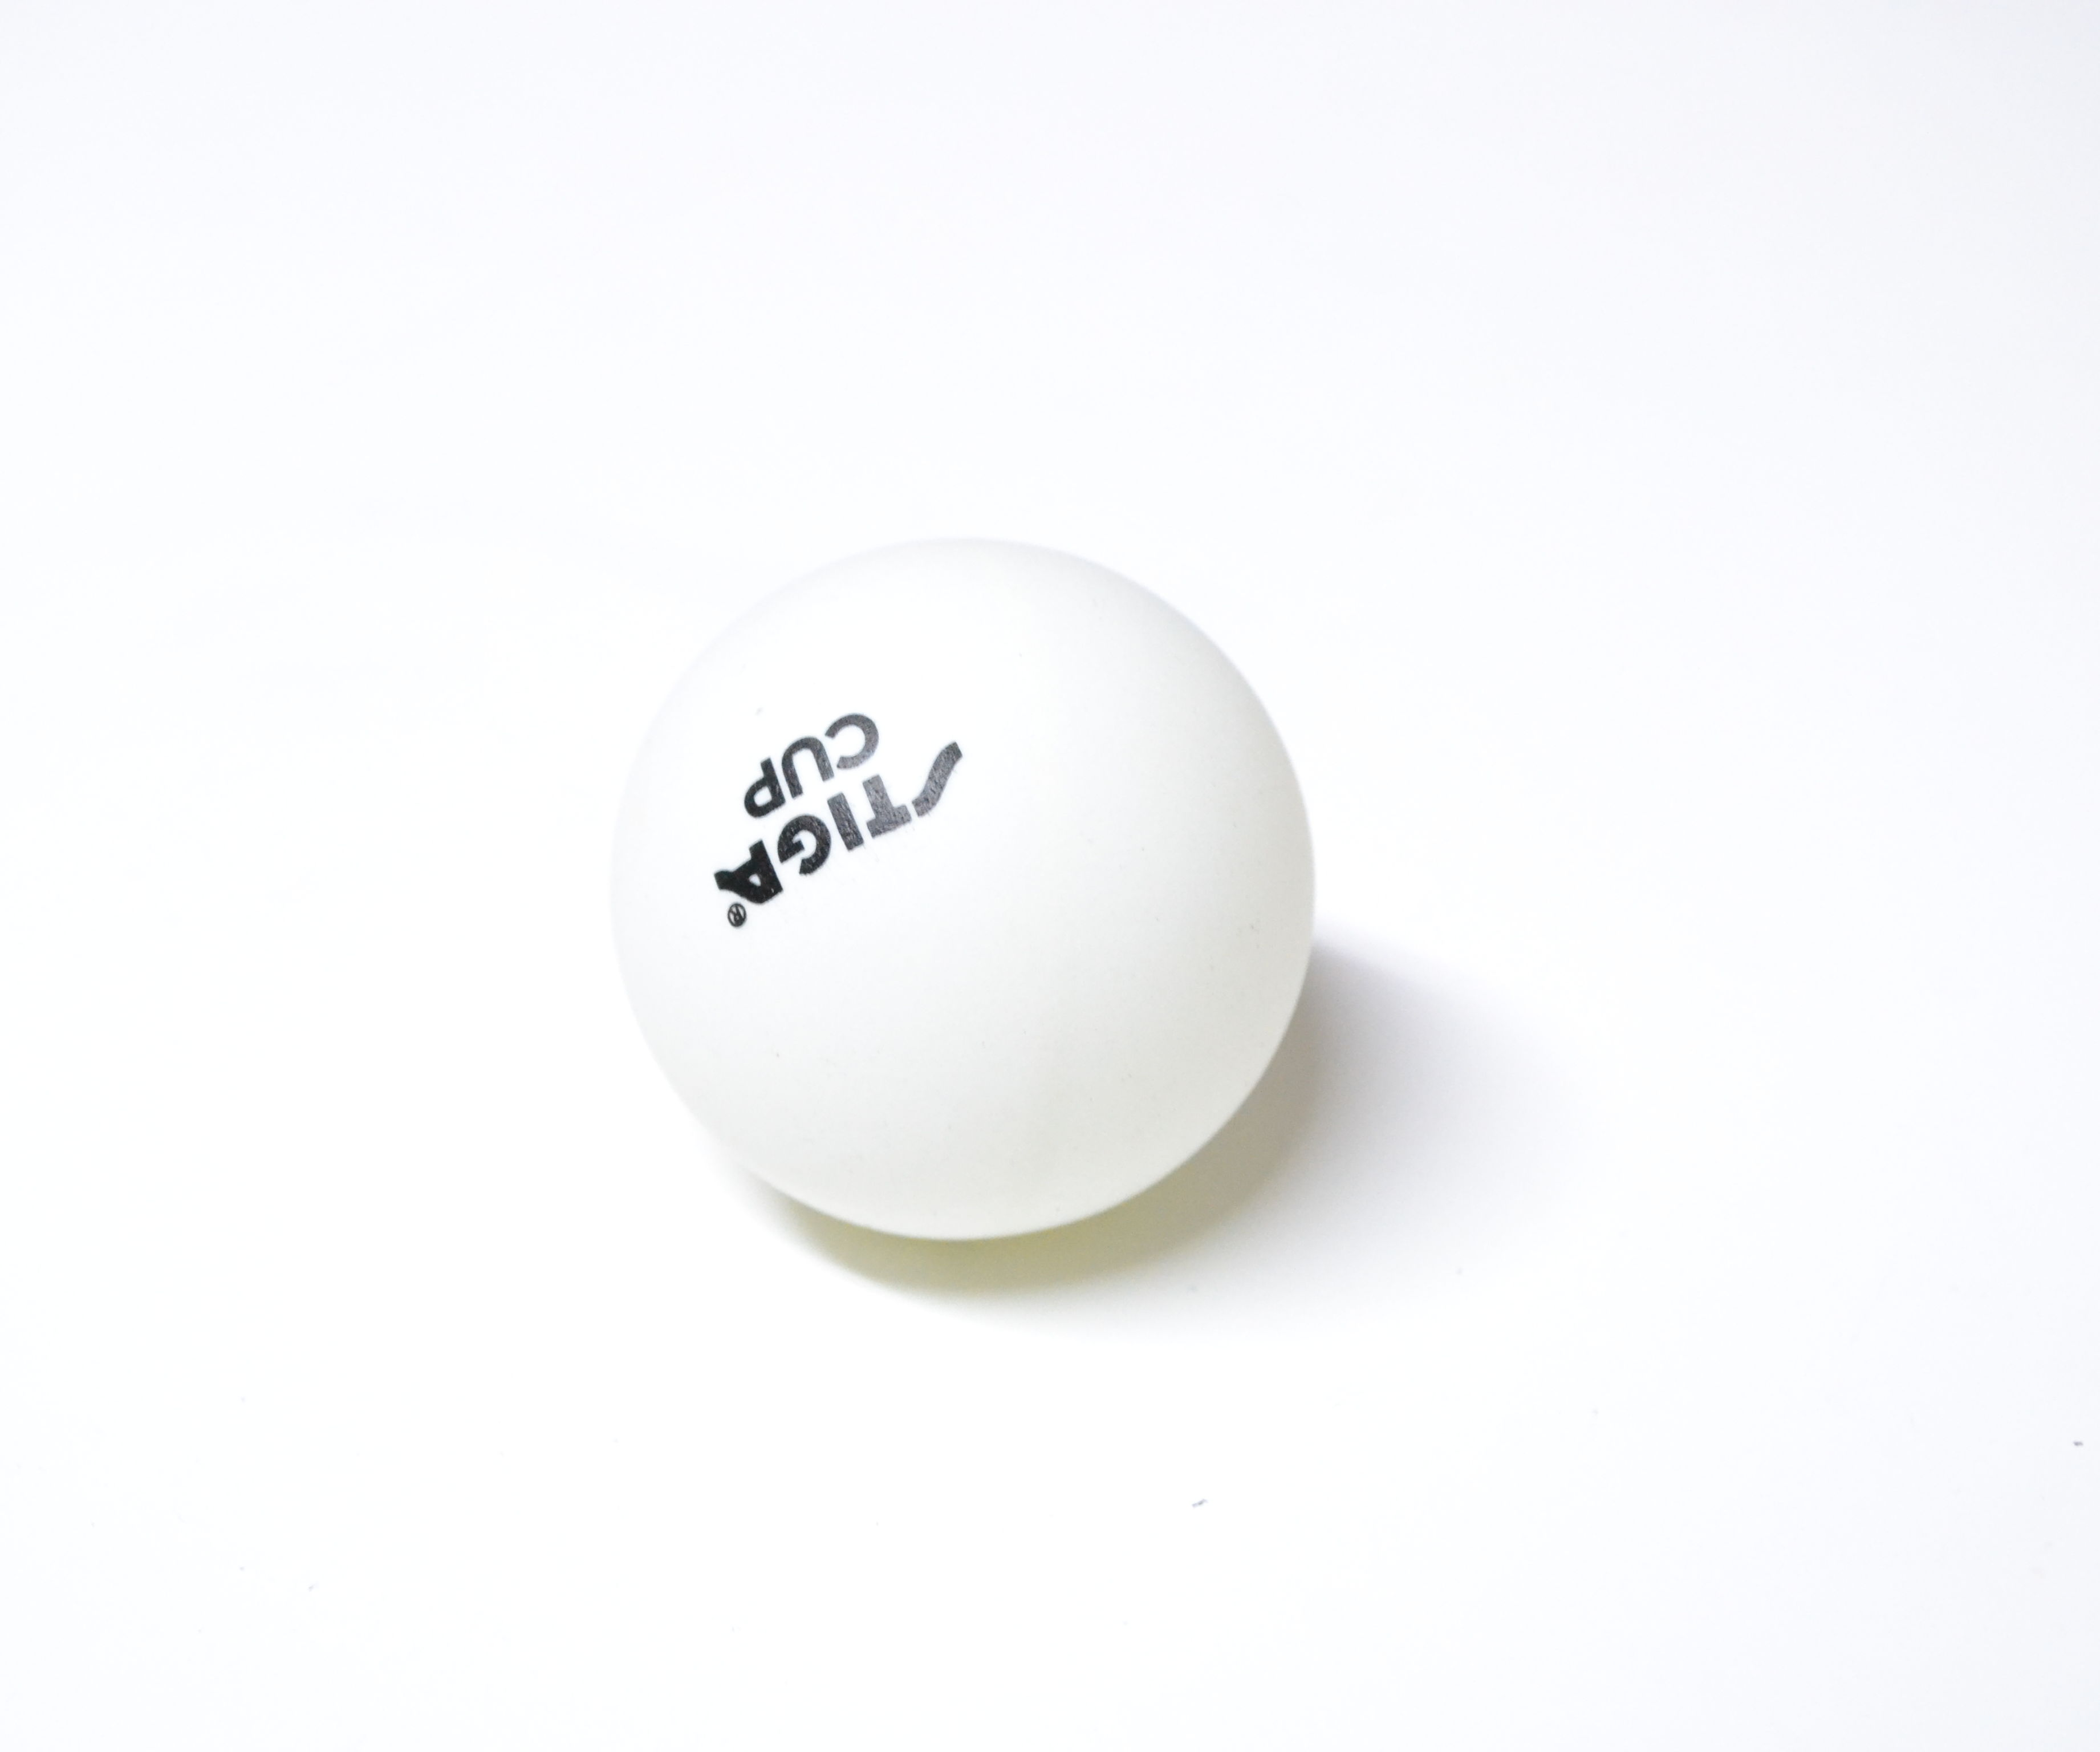 Como Desabollar Una Pelota De Ping Pong